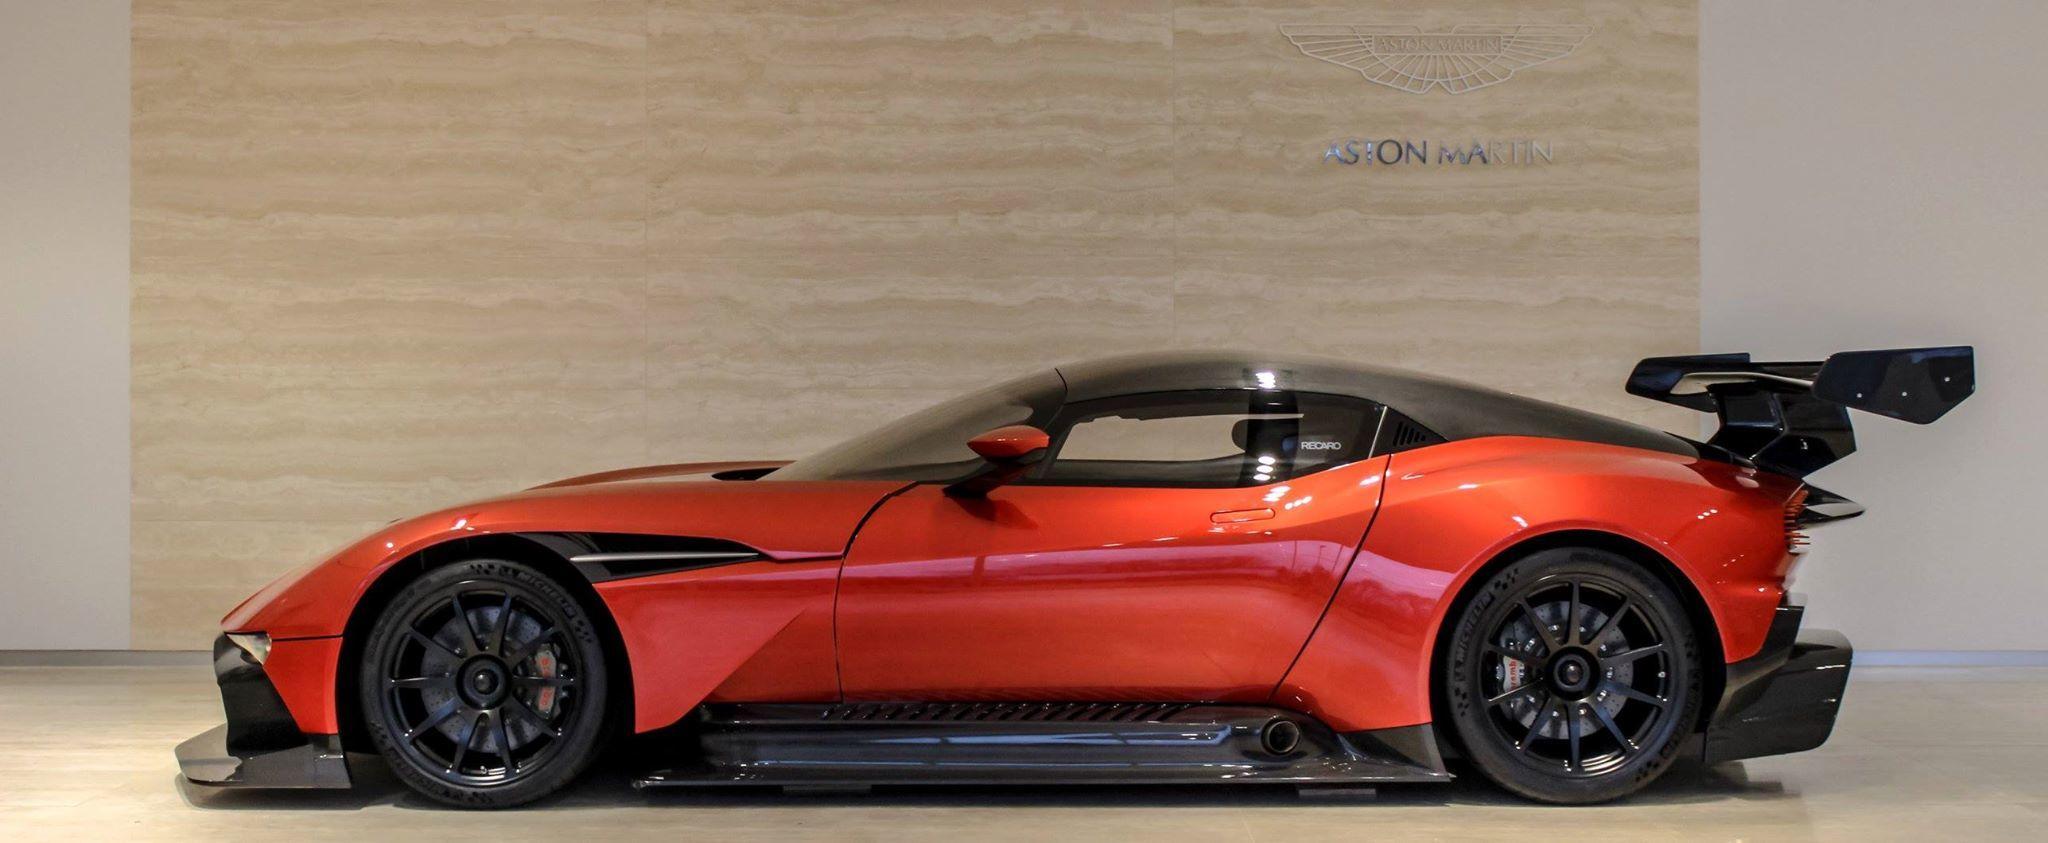 3 4 Million Will Buy You This Aston Martin Vulcan Autoevolution